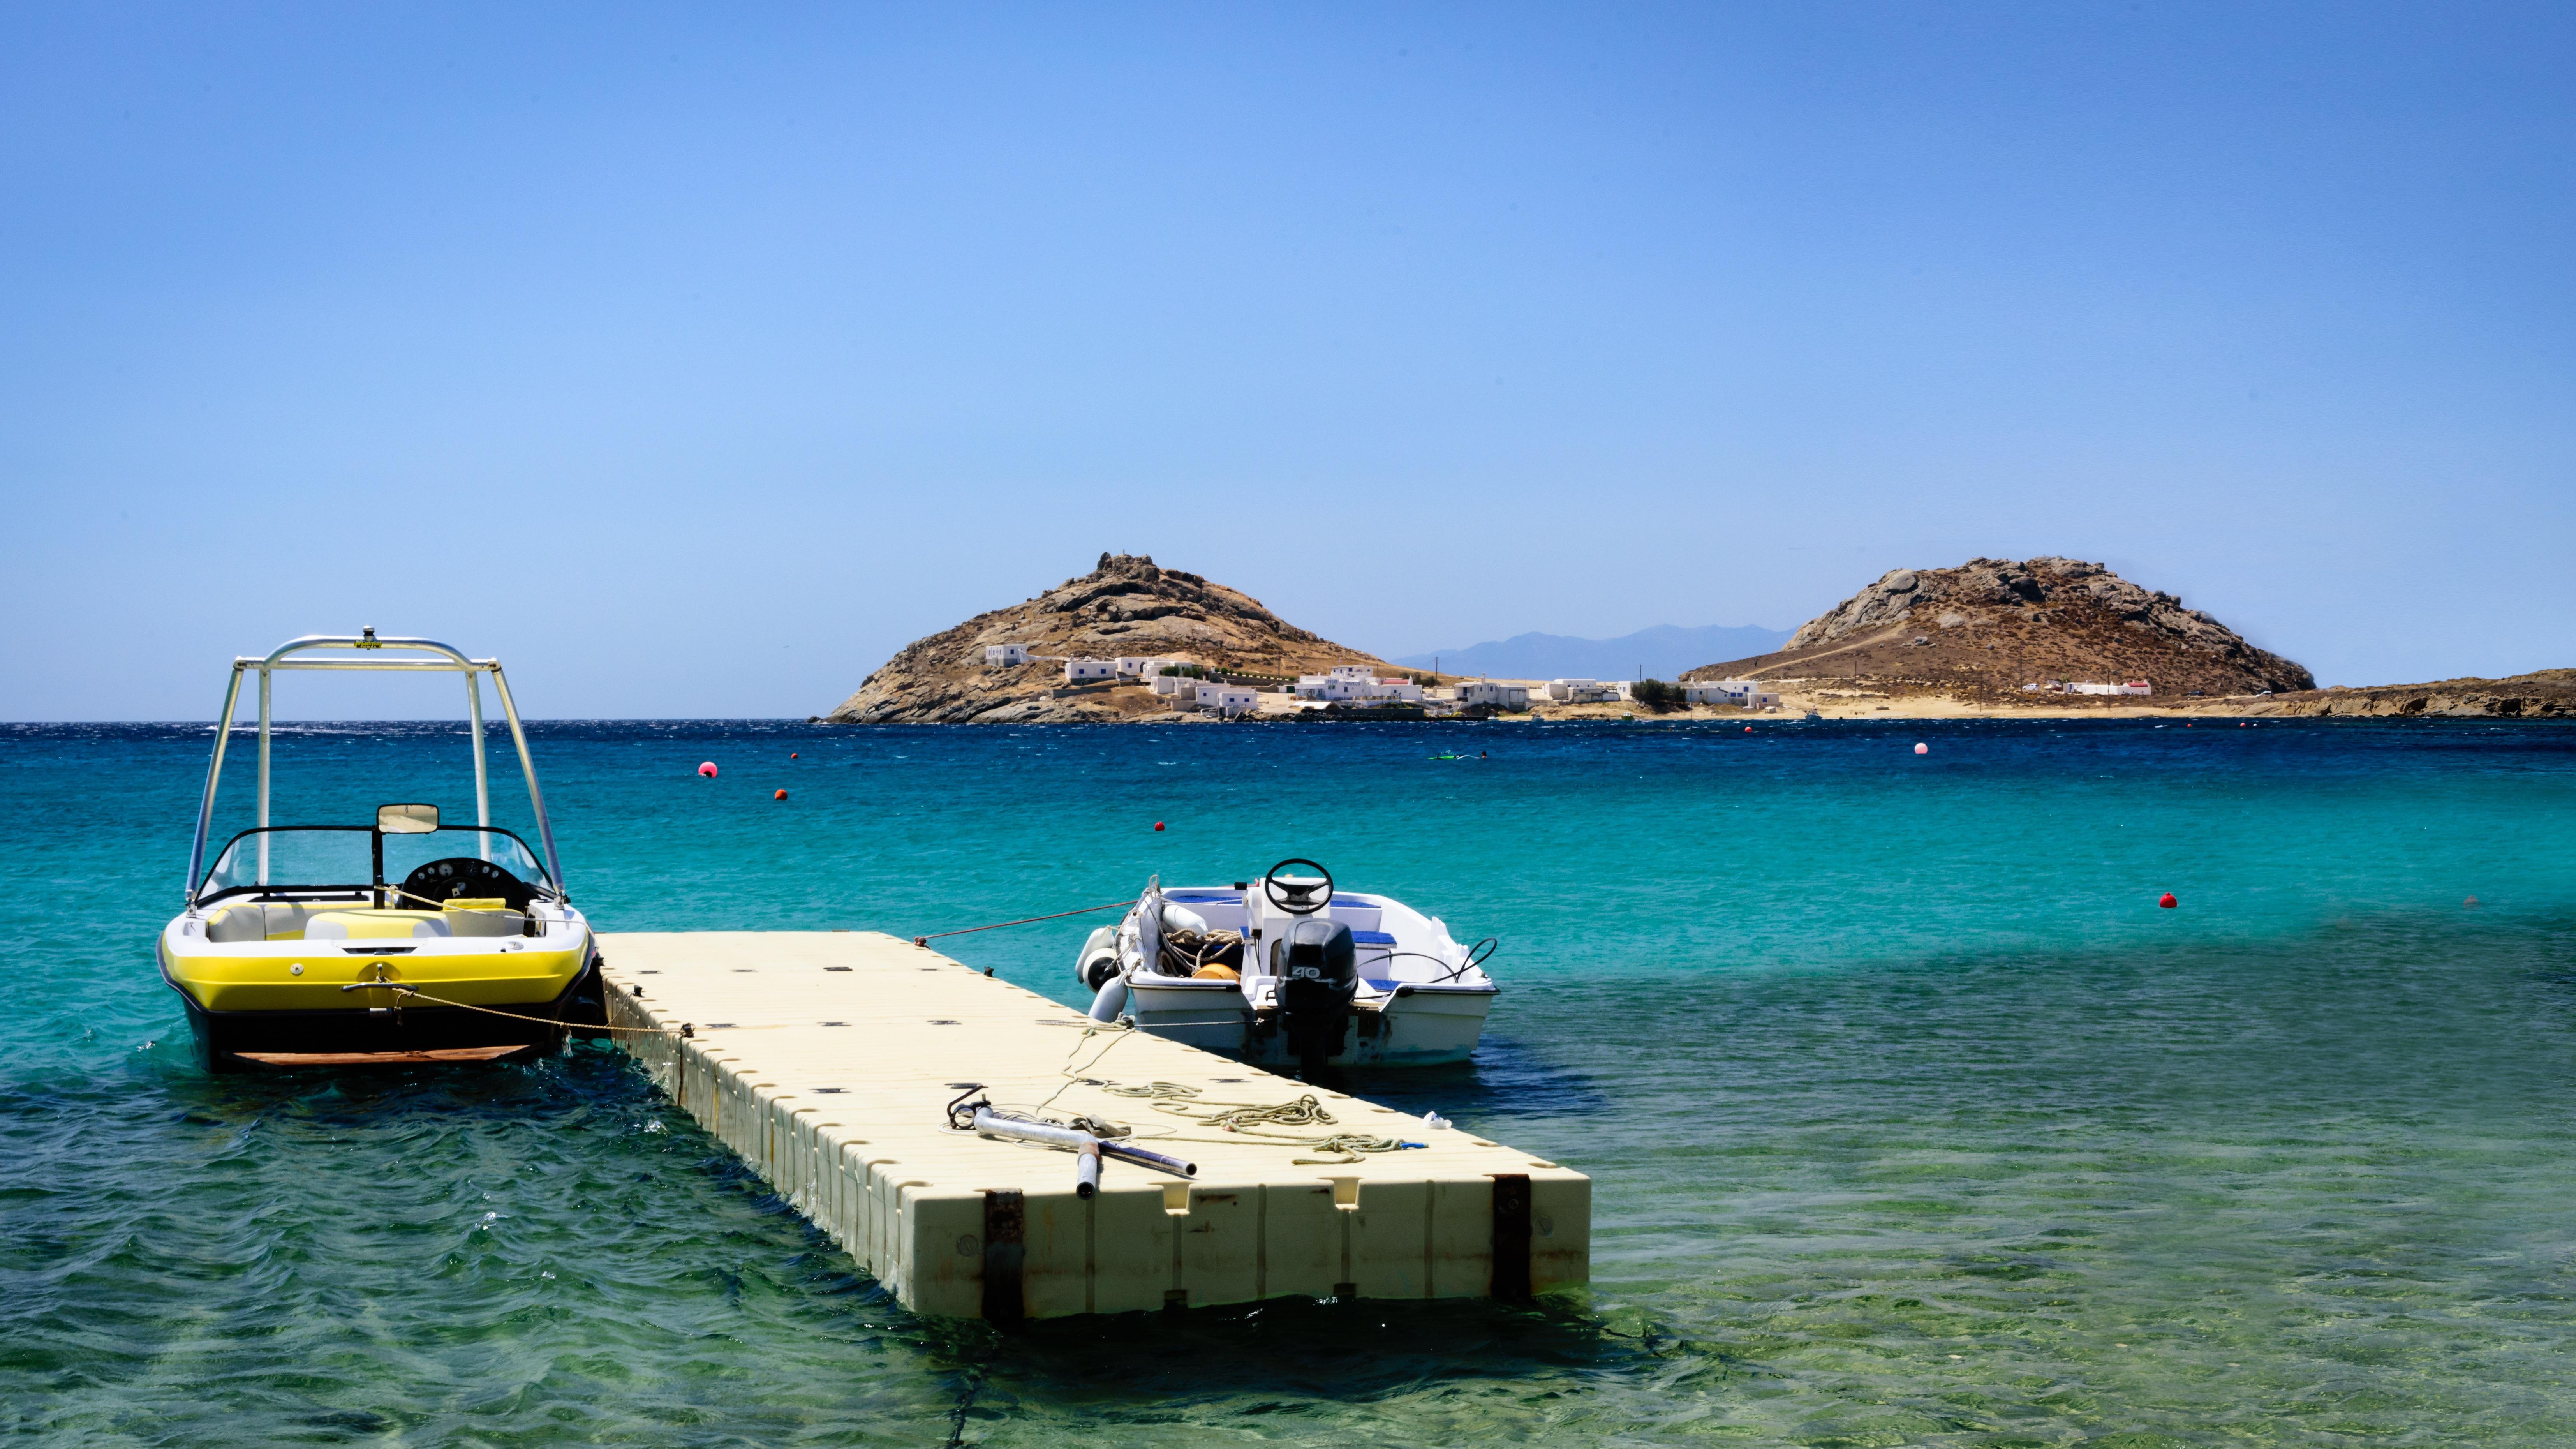 free images : beach, landscape, sea, coast, ocean, sky, boat, shore